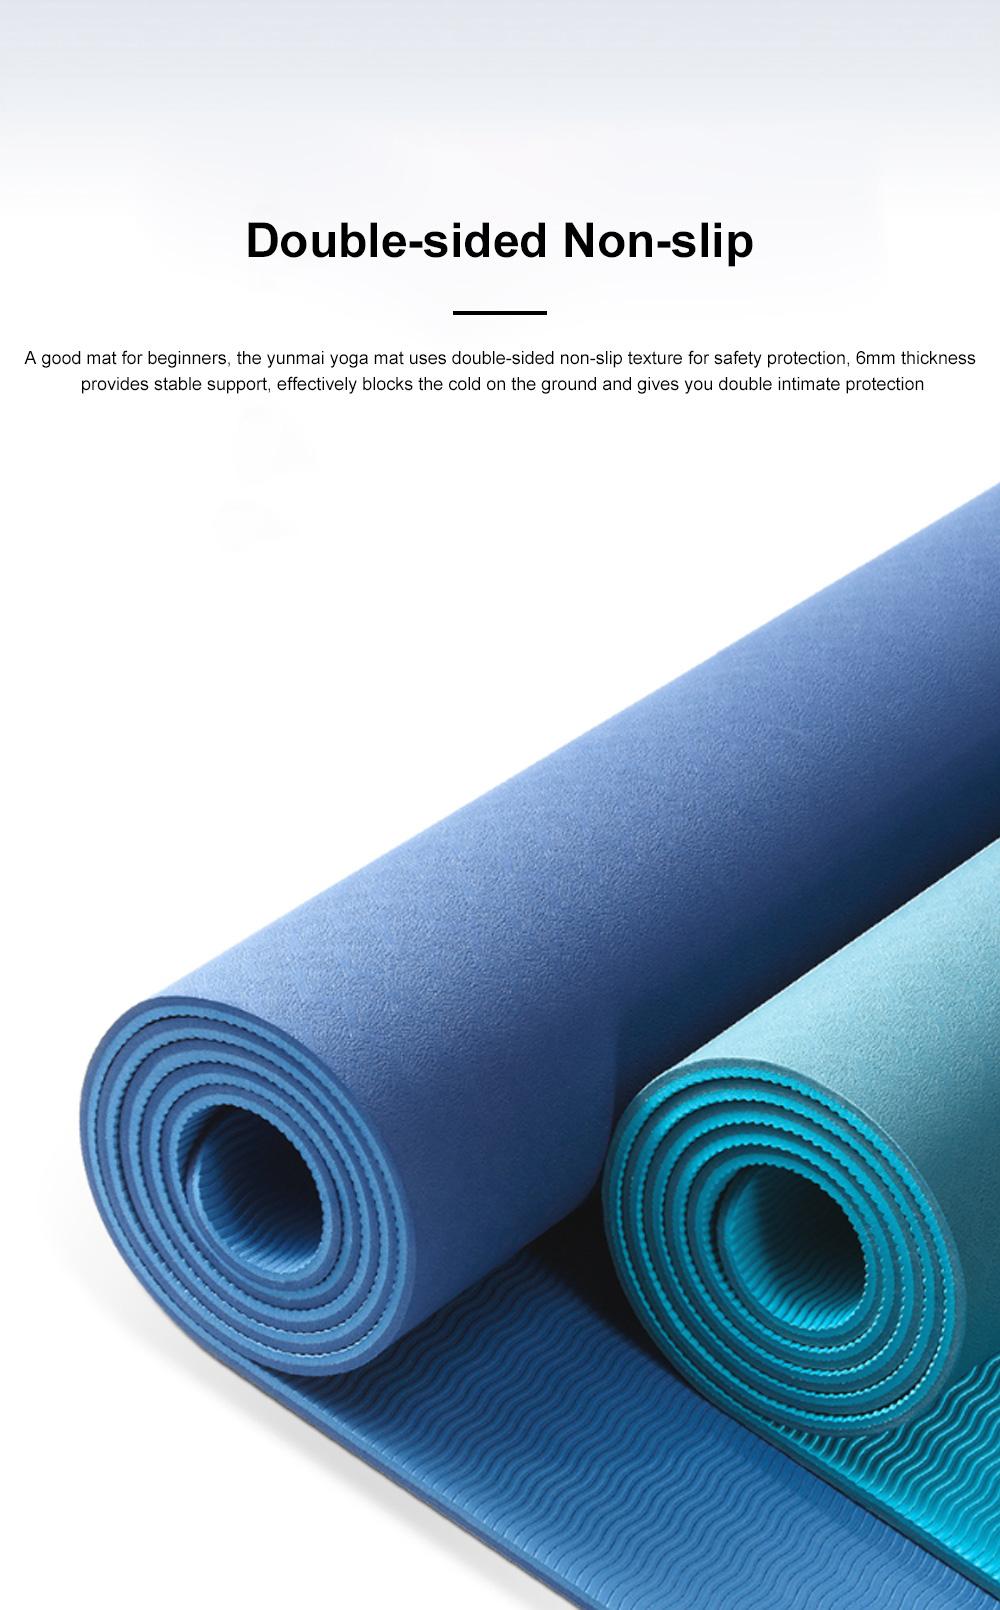 Yunmai Sport Yoga Mat Eco Friendly Durable Yoga Mat Thick Fitness Foldable Travel Exercise Non Slip Yoga Blanket 2